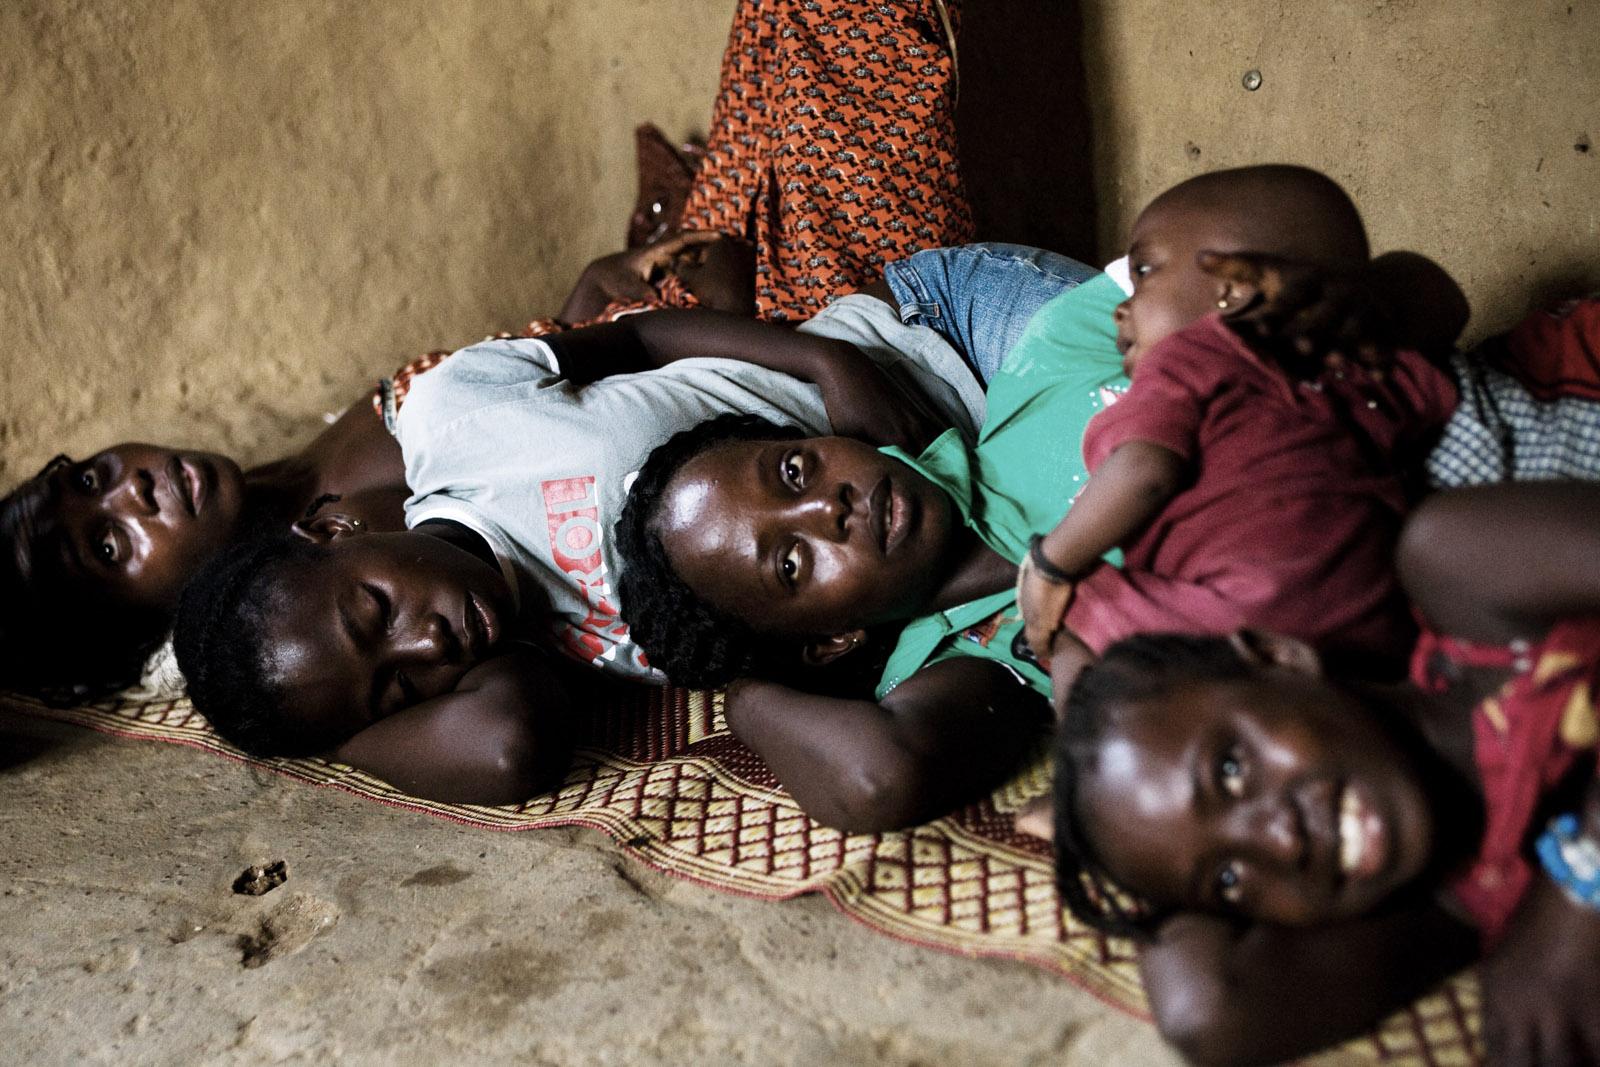 liberia-refugies-ivoiriens-0311-0516hd